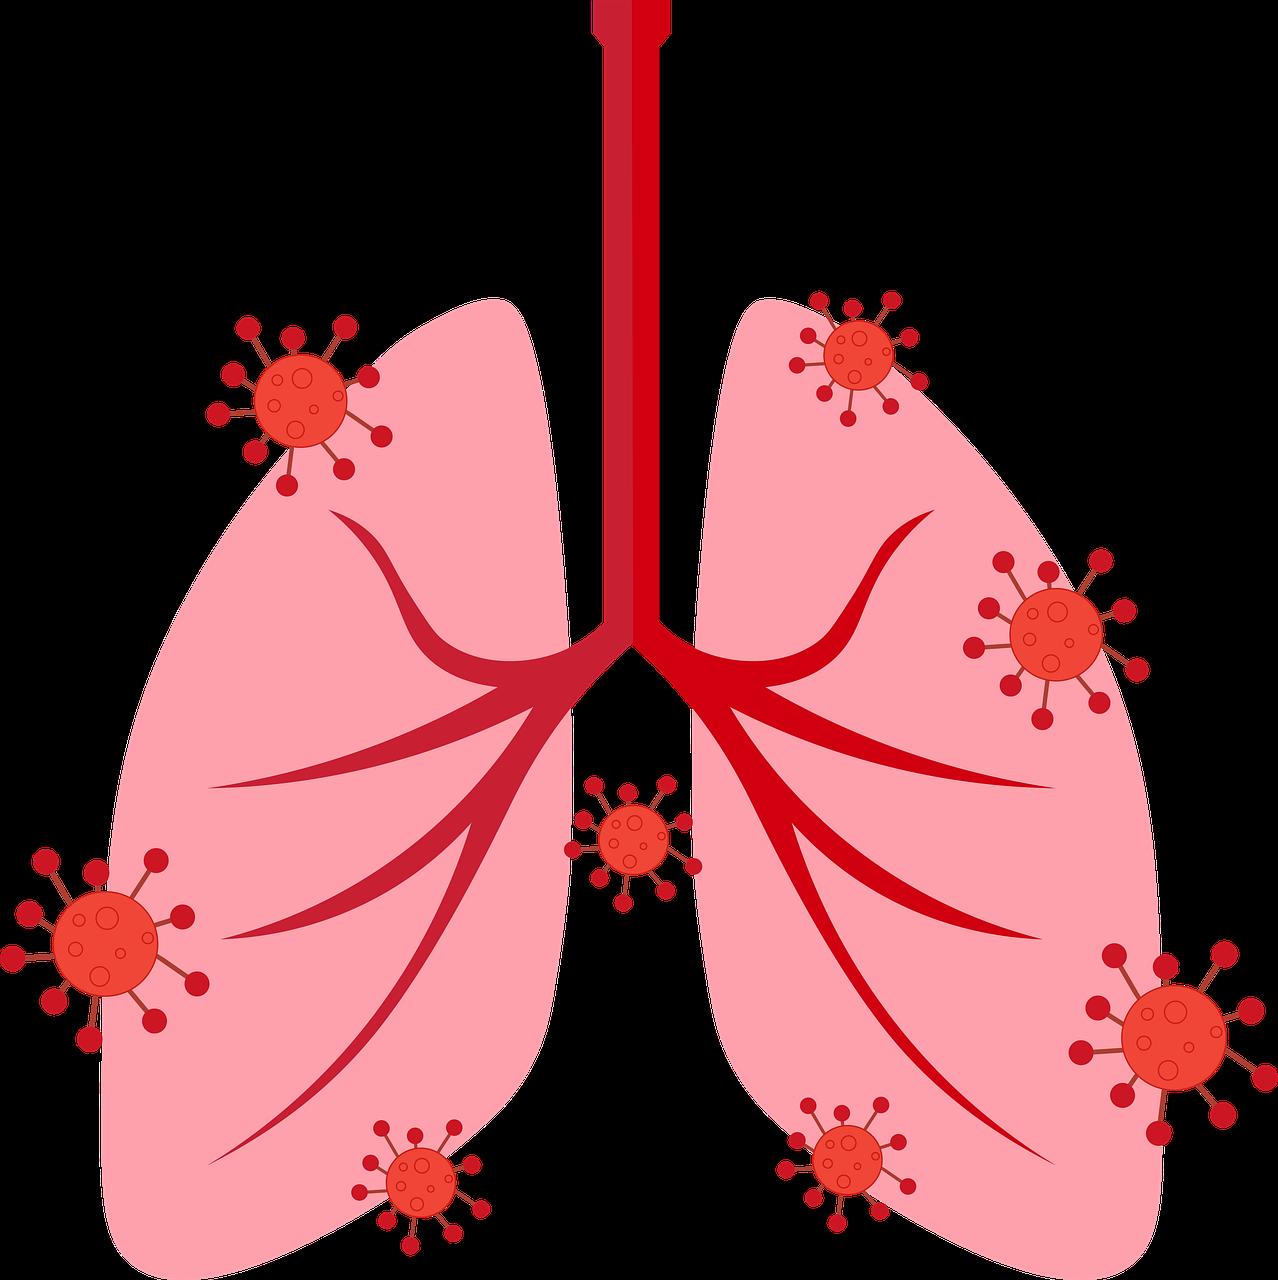 breath, lungs, respiratory